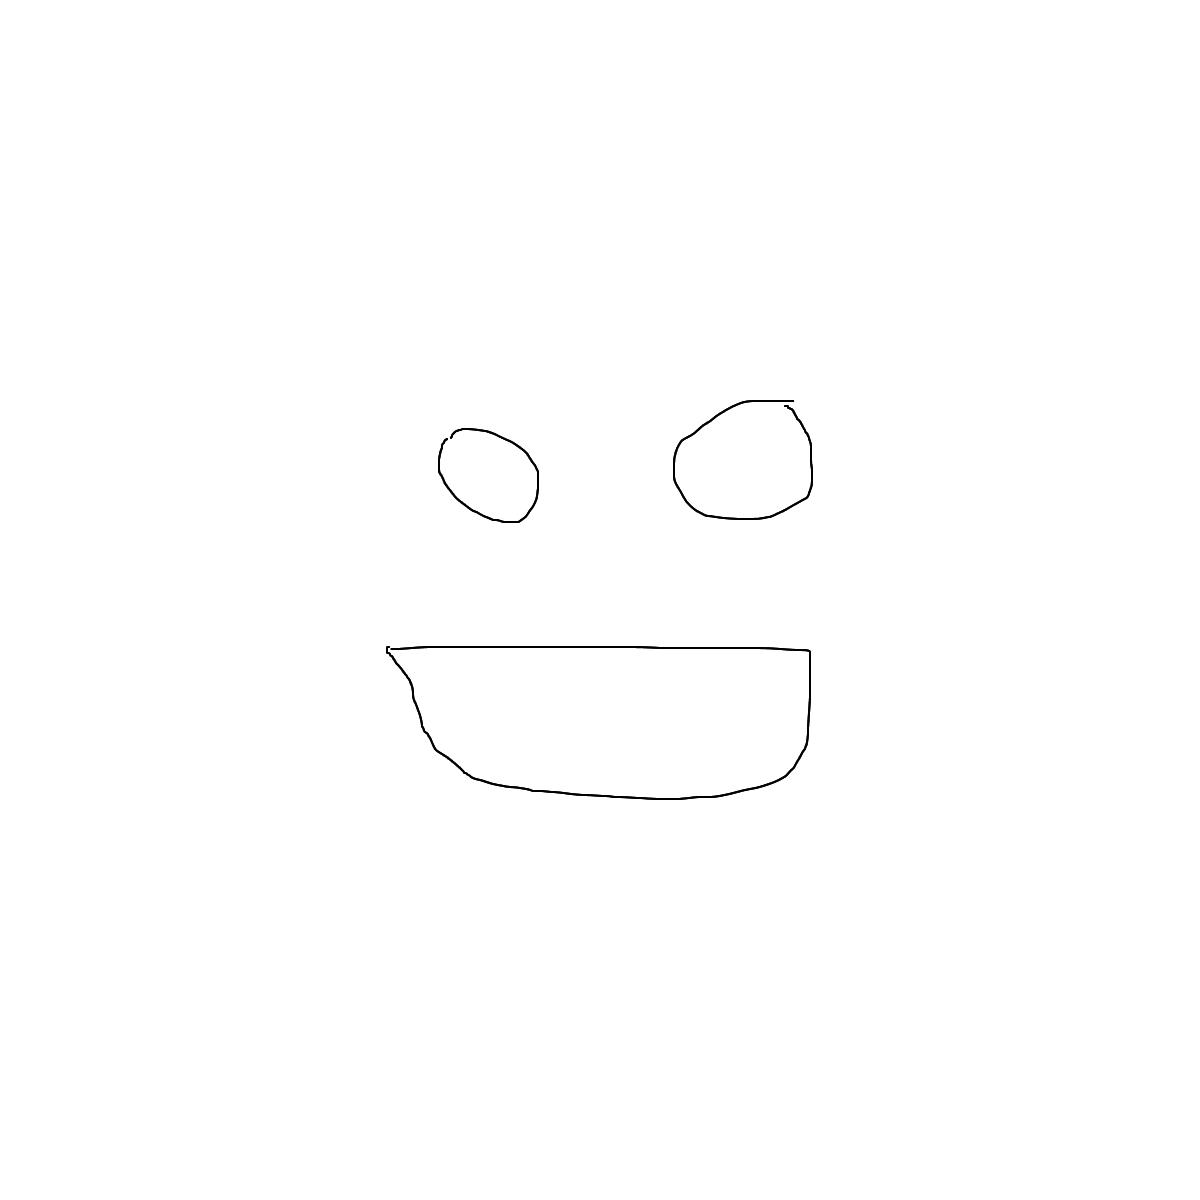 BAAAM drawing#3798 lat:46.2612228393554700lng: -63.1498413085937500